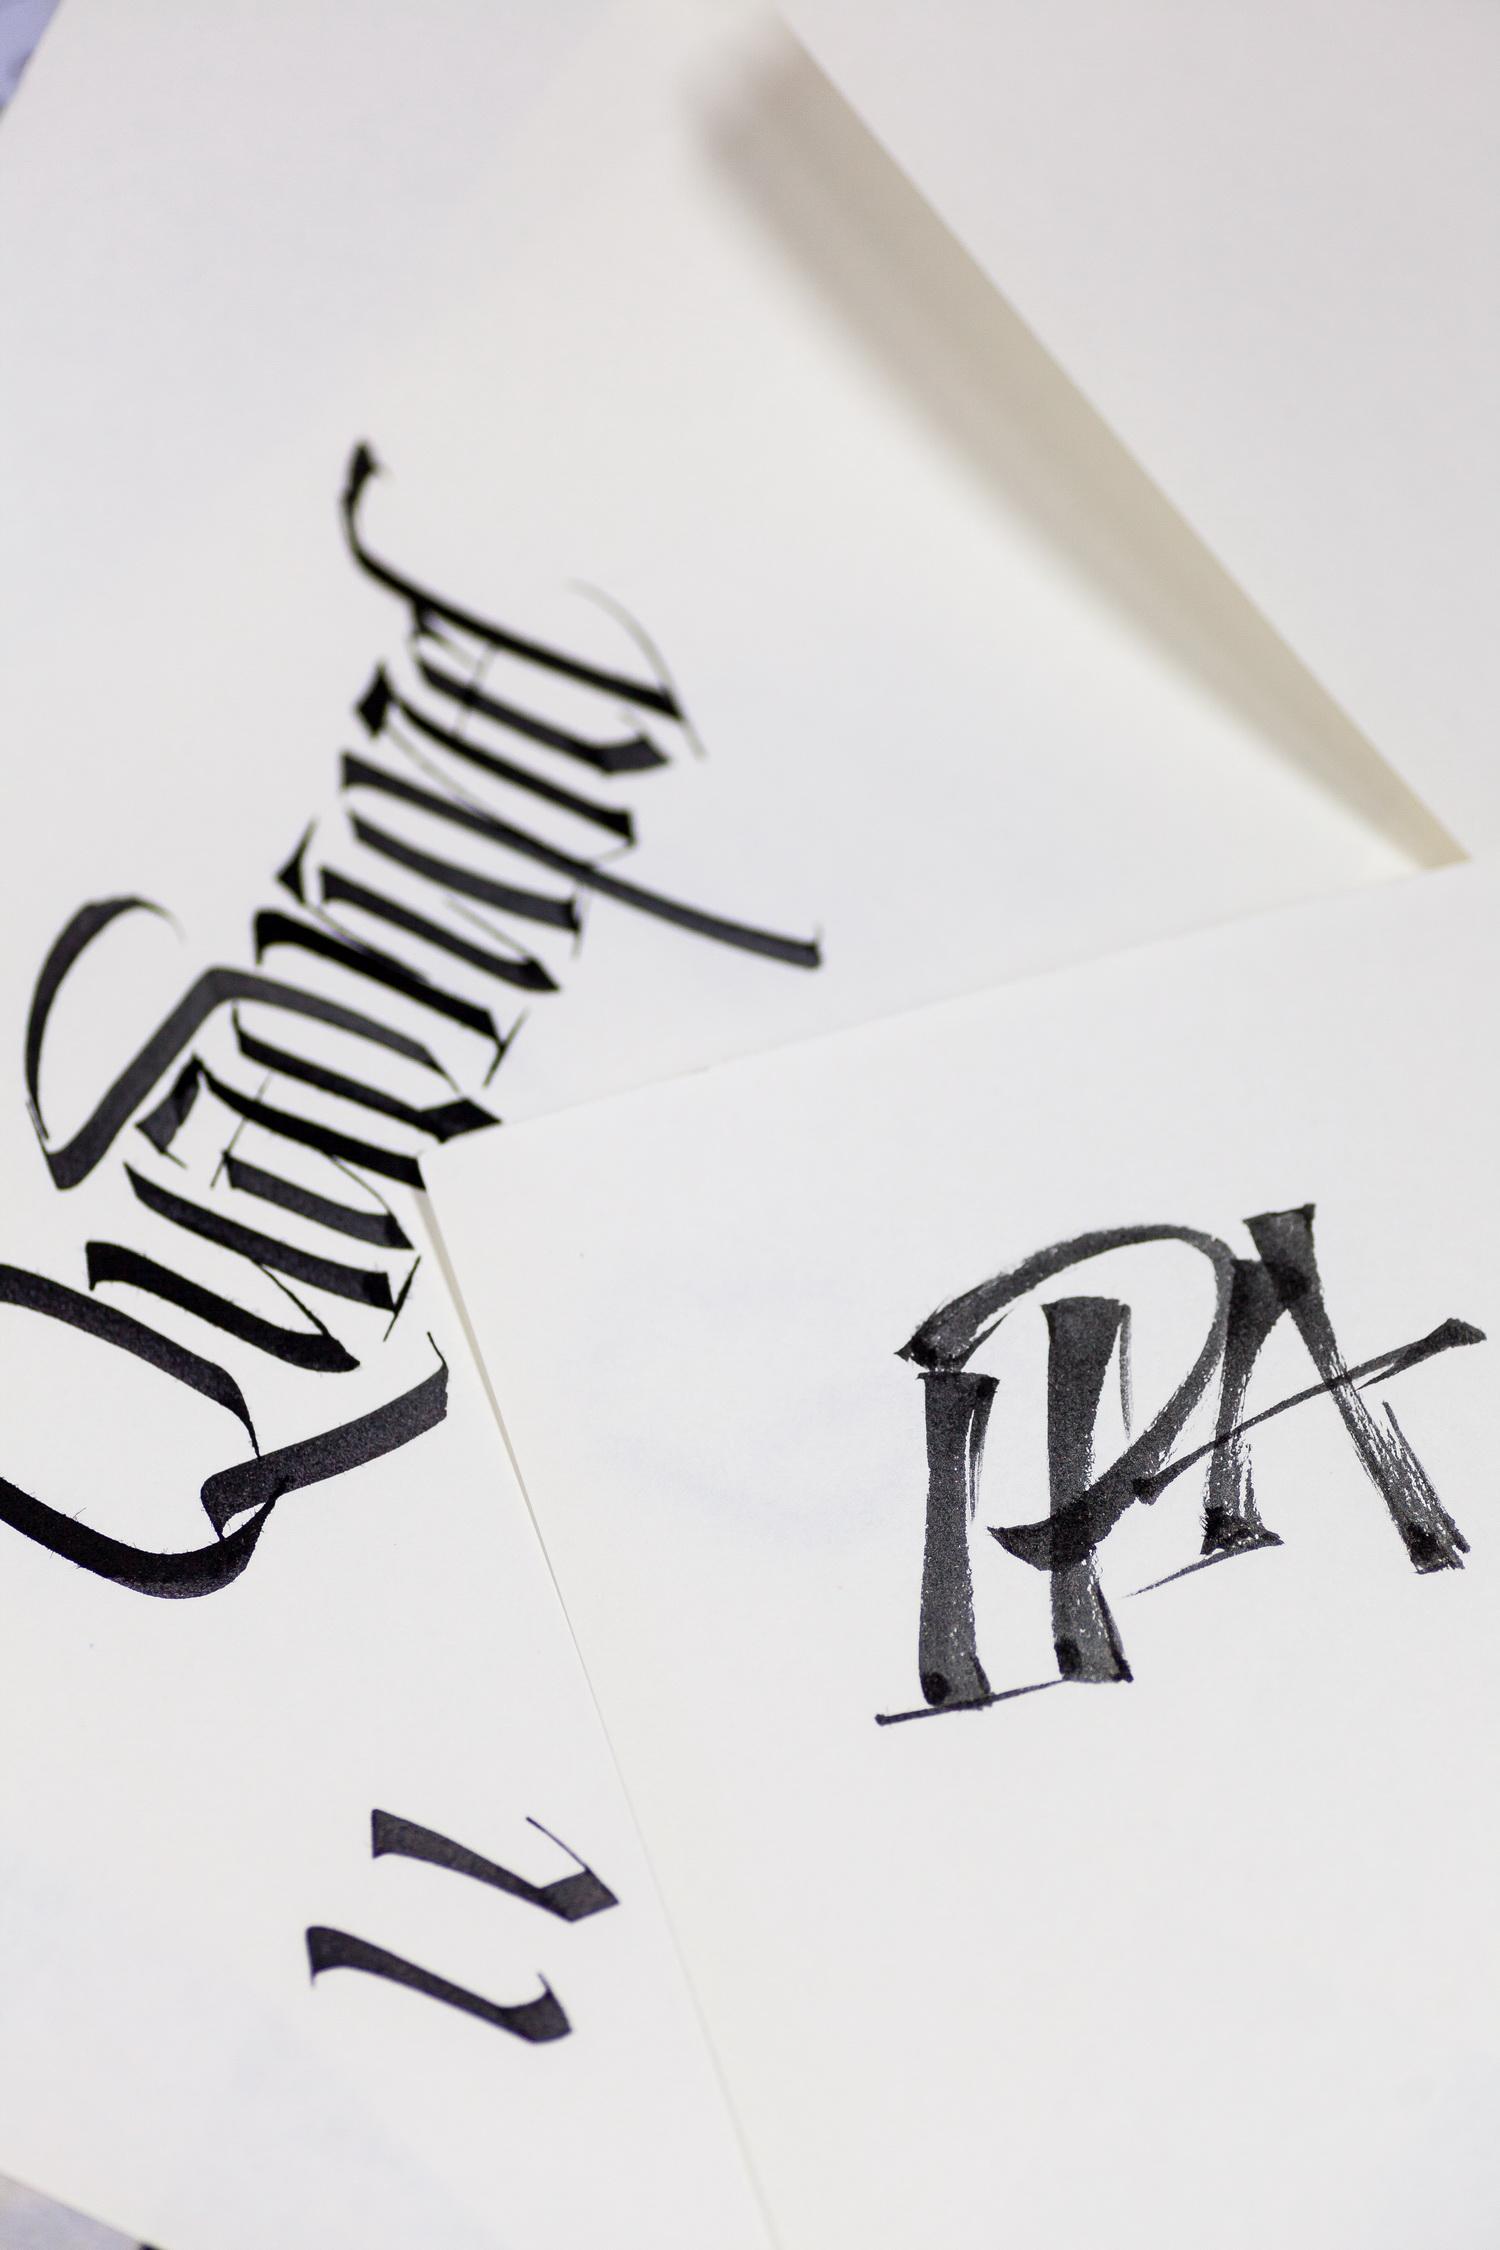 Craft Beer Label Design for Quadrupel IPA / World Brand & Packaging Design Society